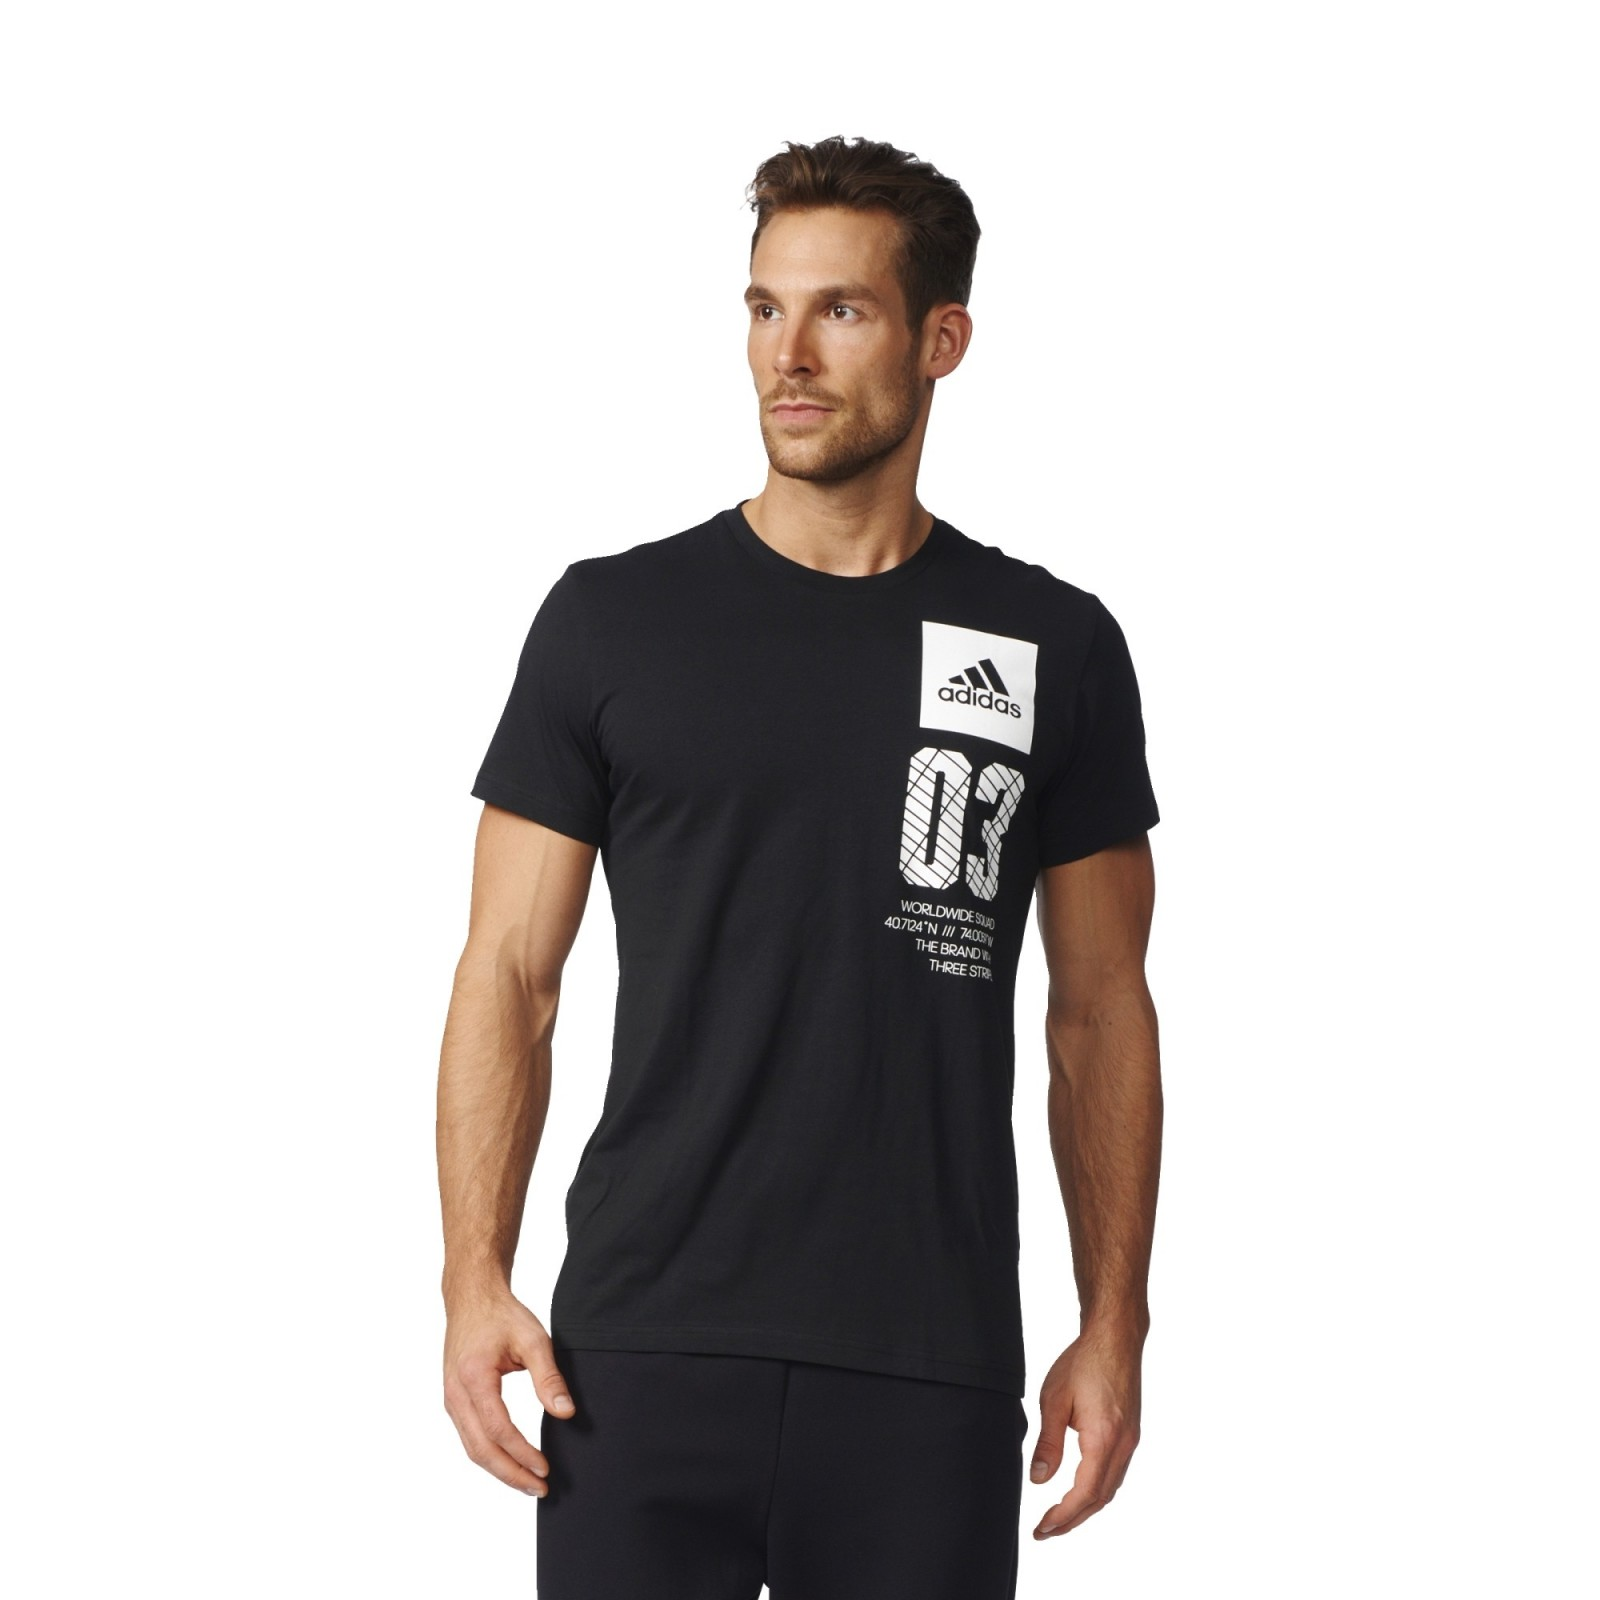 b3780f54dfa Pánské tričko adidas CITY NEW YORK